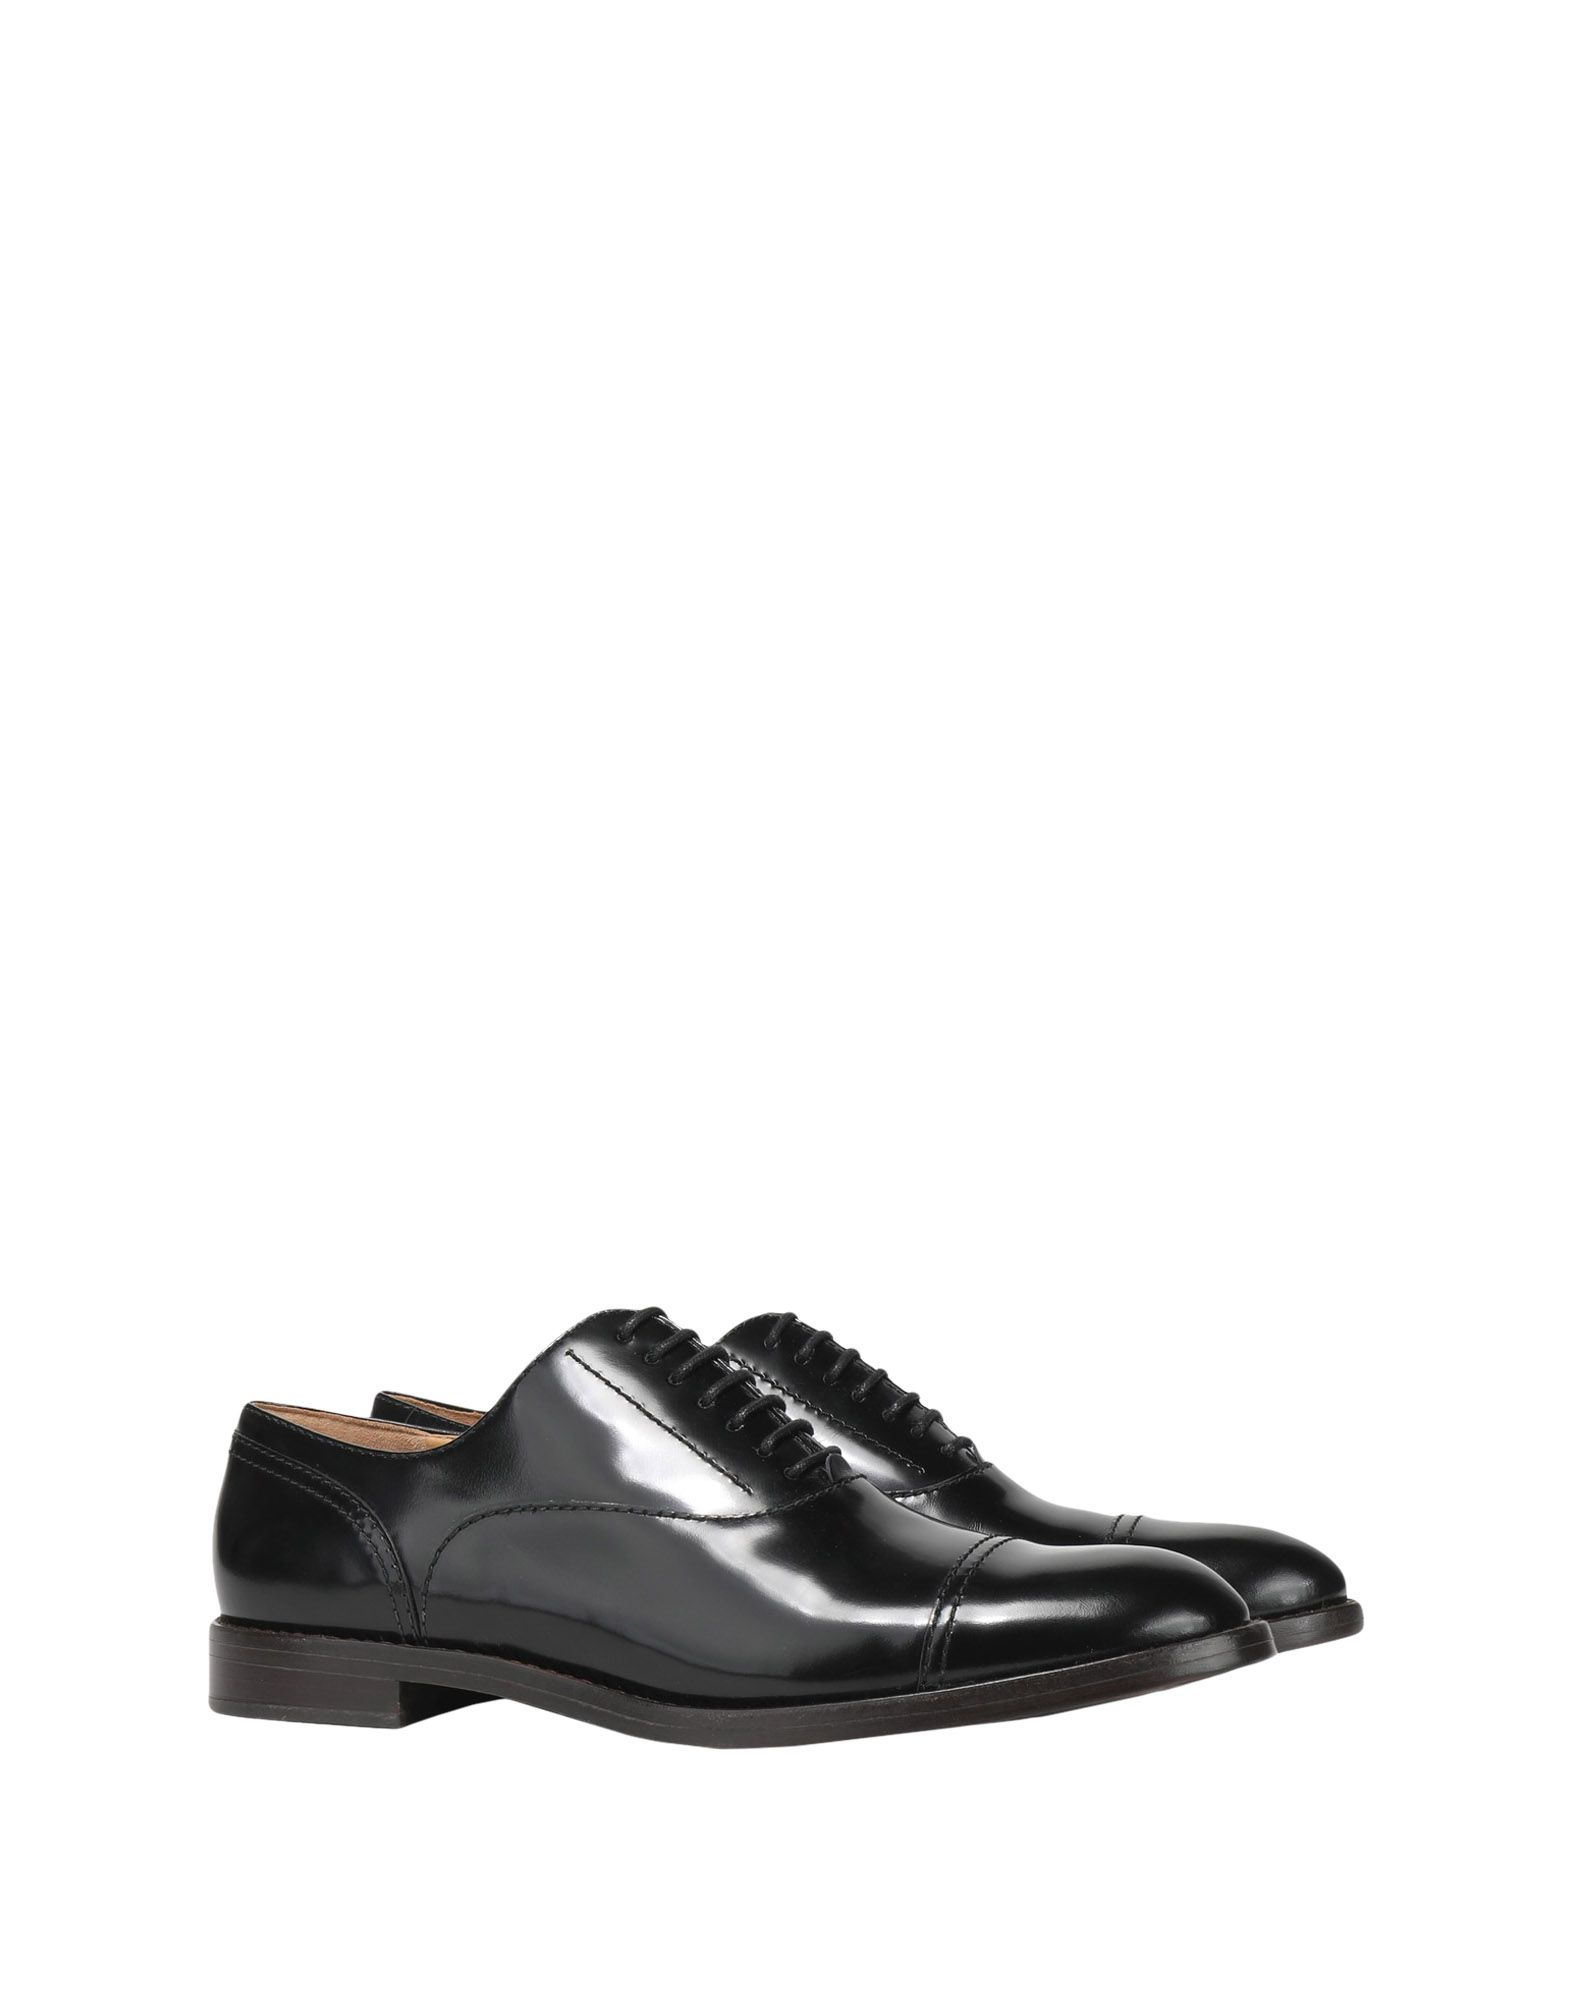 Marc Jacobs Schnürschuhe strapazierfähige Damen  11518971NDGut aussehende strapazierfähige Schnürschuhe Schuhe d65850